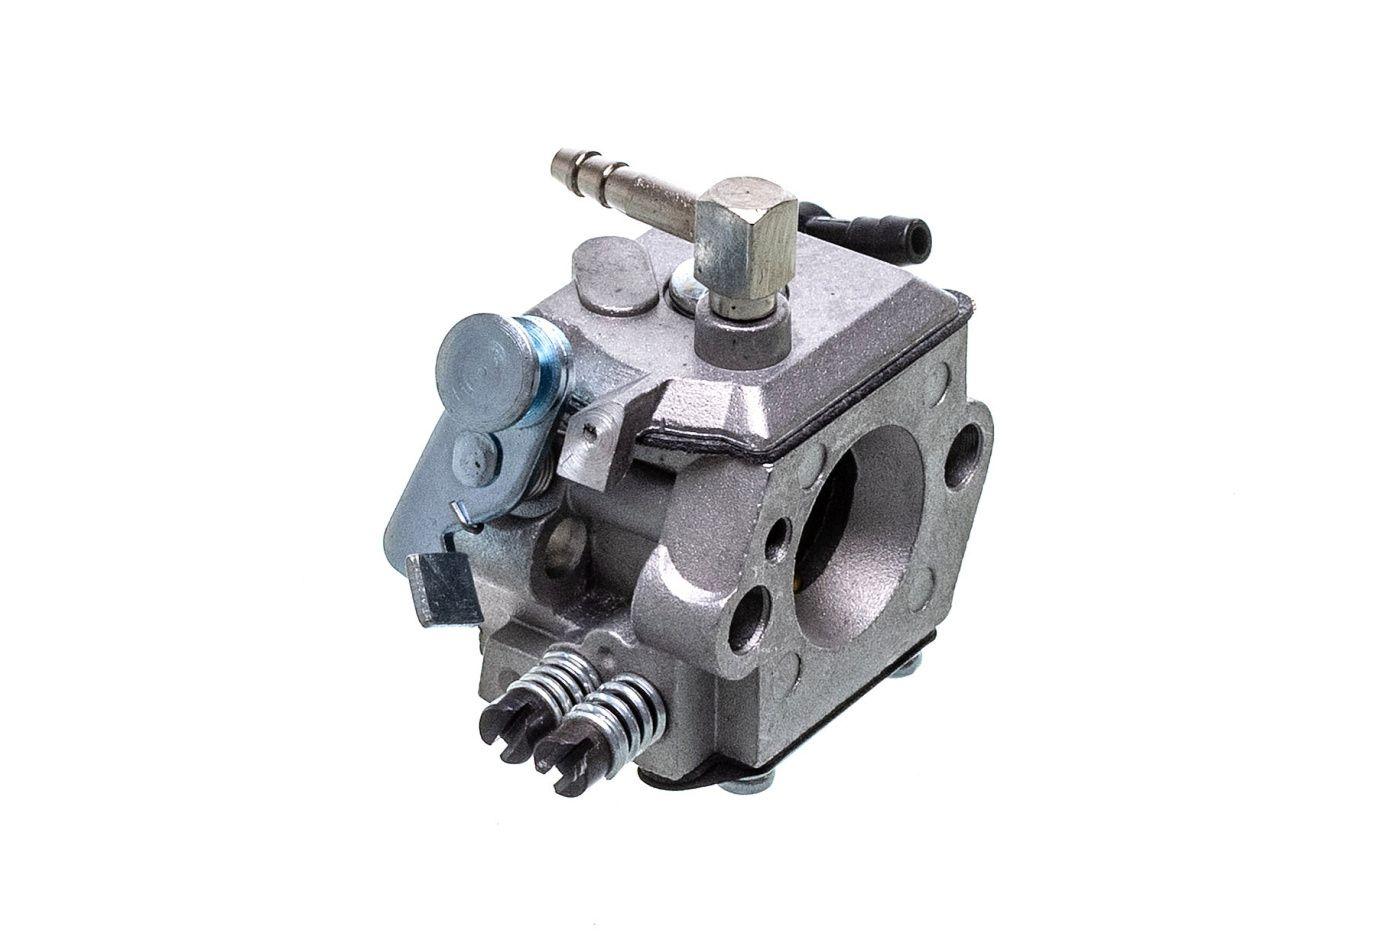 Karburátor Stihl 028, 028AV, 028 SUPER